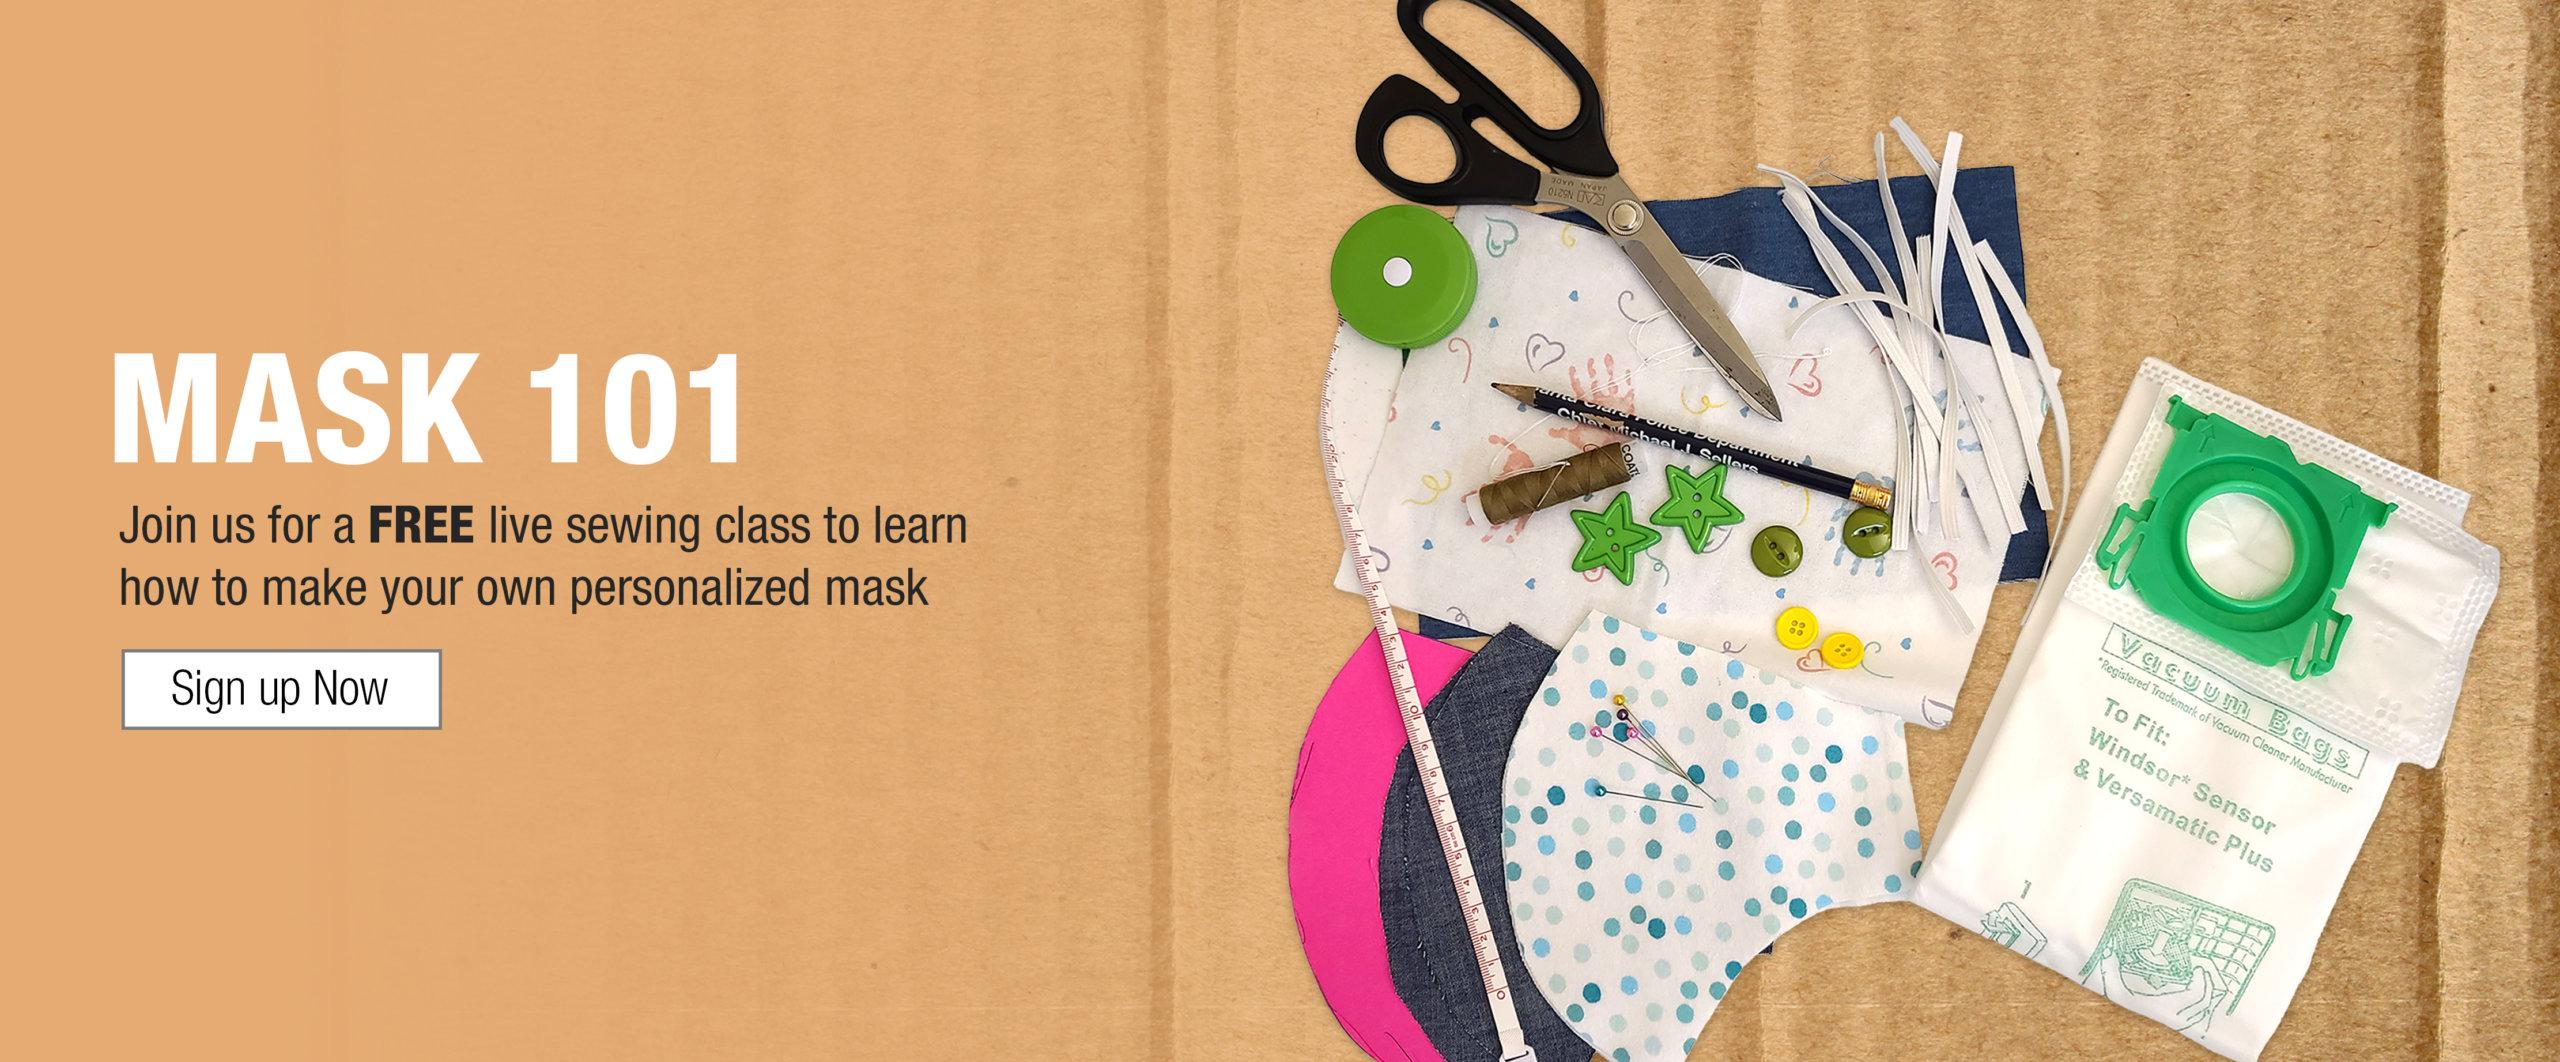 Mask 101-Free Sewing Class